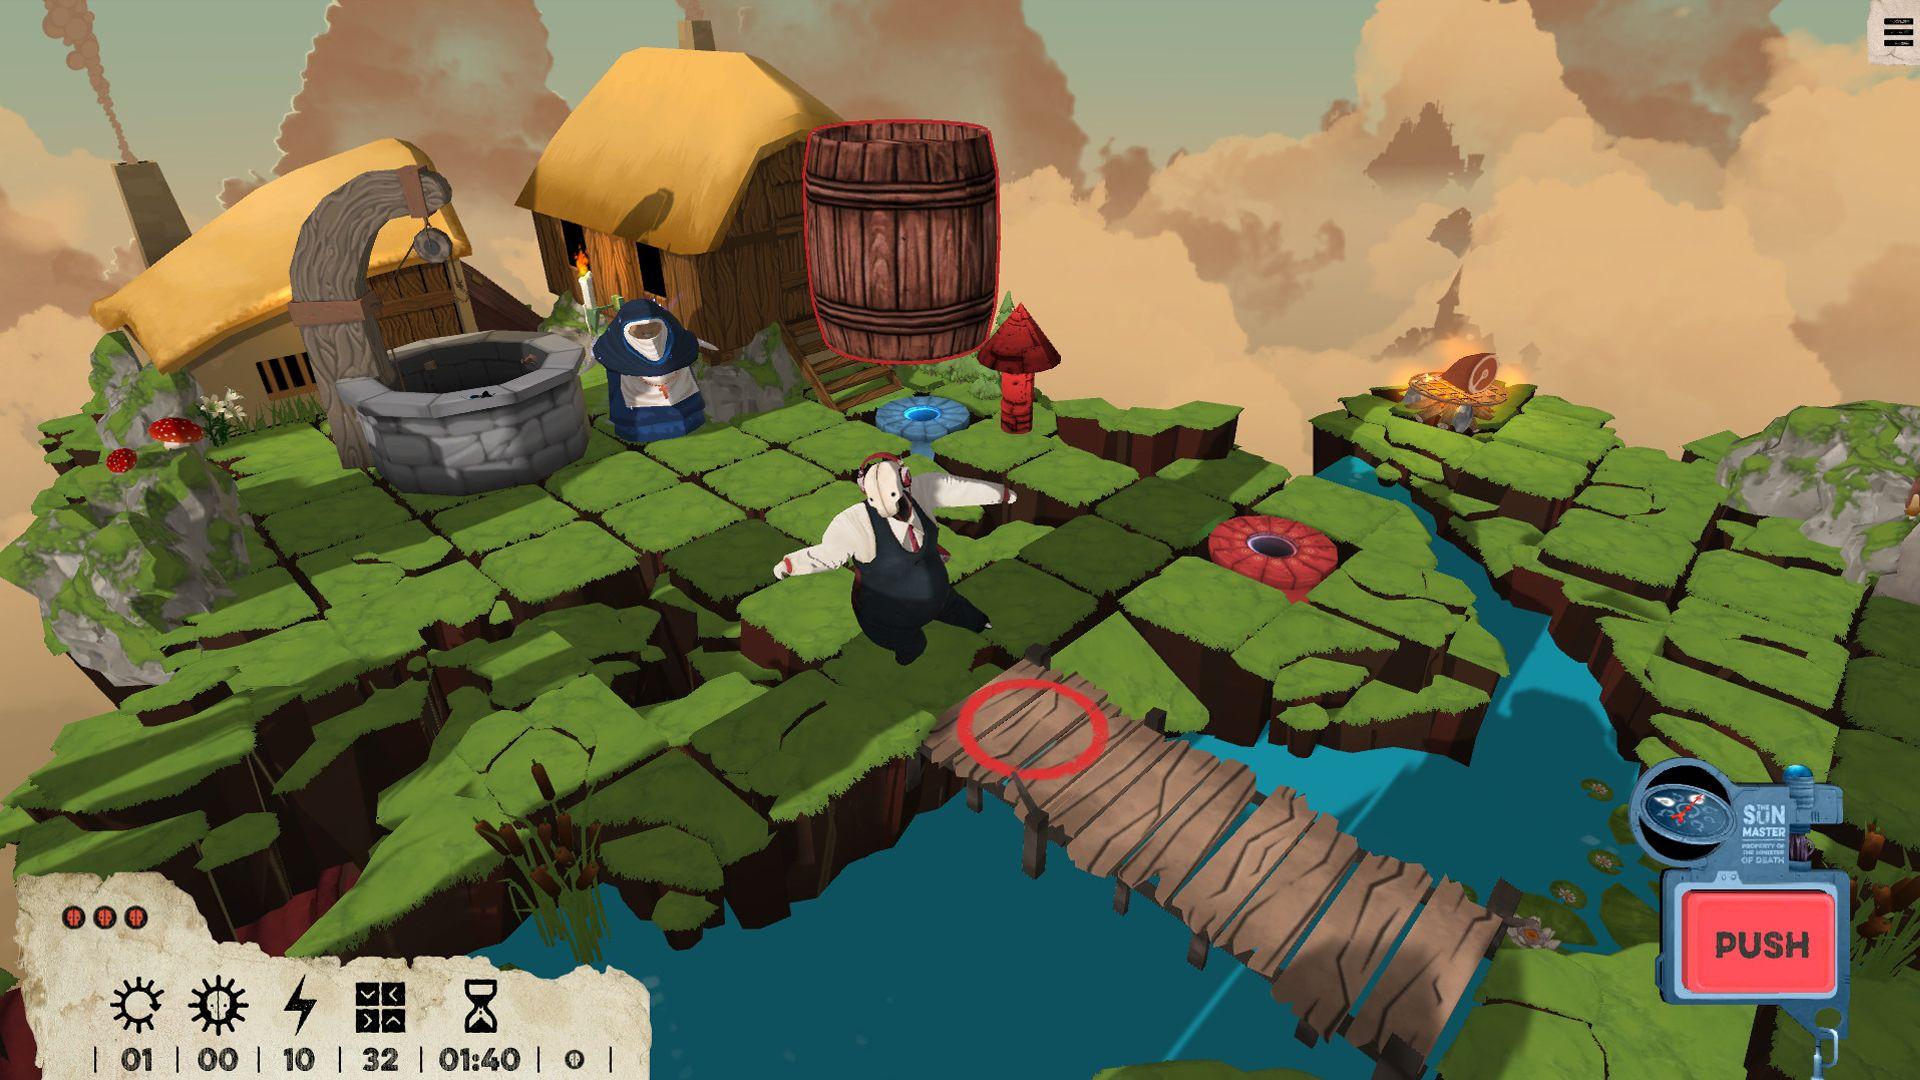 Screenshot from Felix the Reaper (6/10)